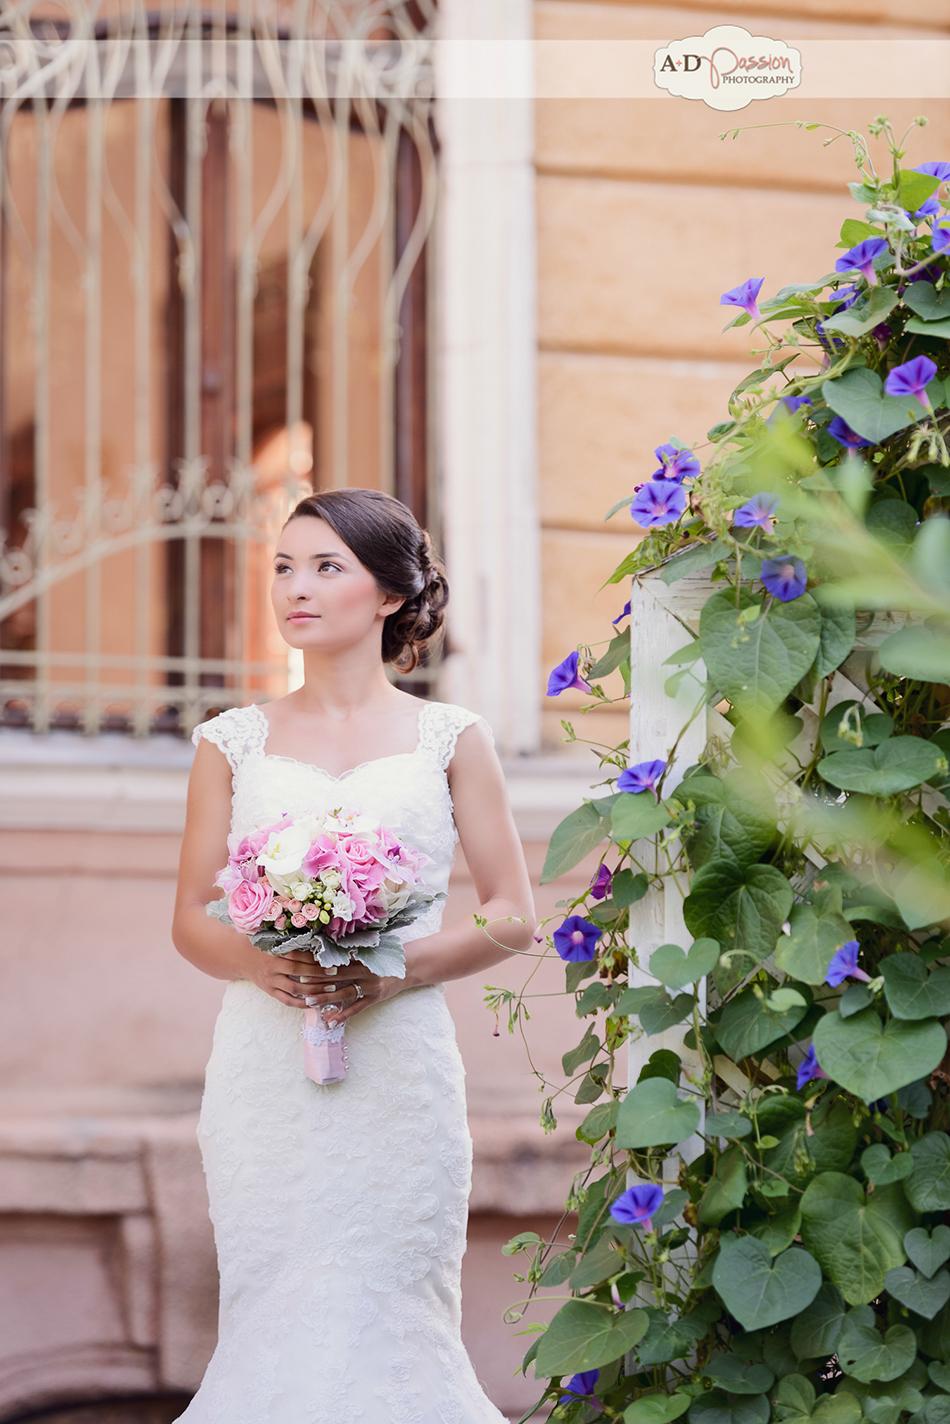 AD Passion Photography | 20130804_ana+calin_fotografie-vintage_fotograf-nunta-oradea_fotograf-profesionist_0062 | Adelin, Dida, fotograf profesionist, fotograf de nunta, fotografie de nunta, fotograf Timisoara, fotograf Craiova, fotograf Bucuresti, fotograf Arad, nunta Timisoara, nunta Arad, nunta Bucuresti, nunta Craiova